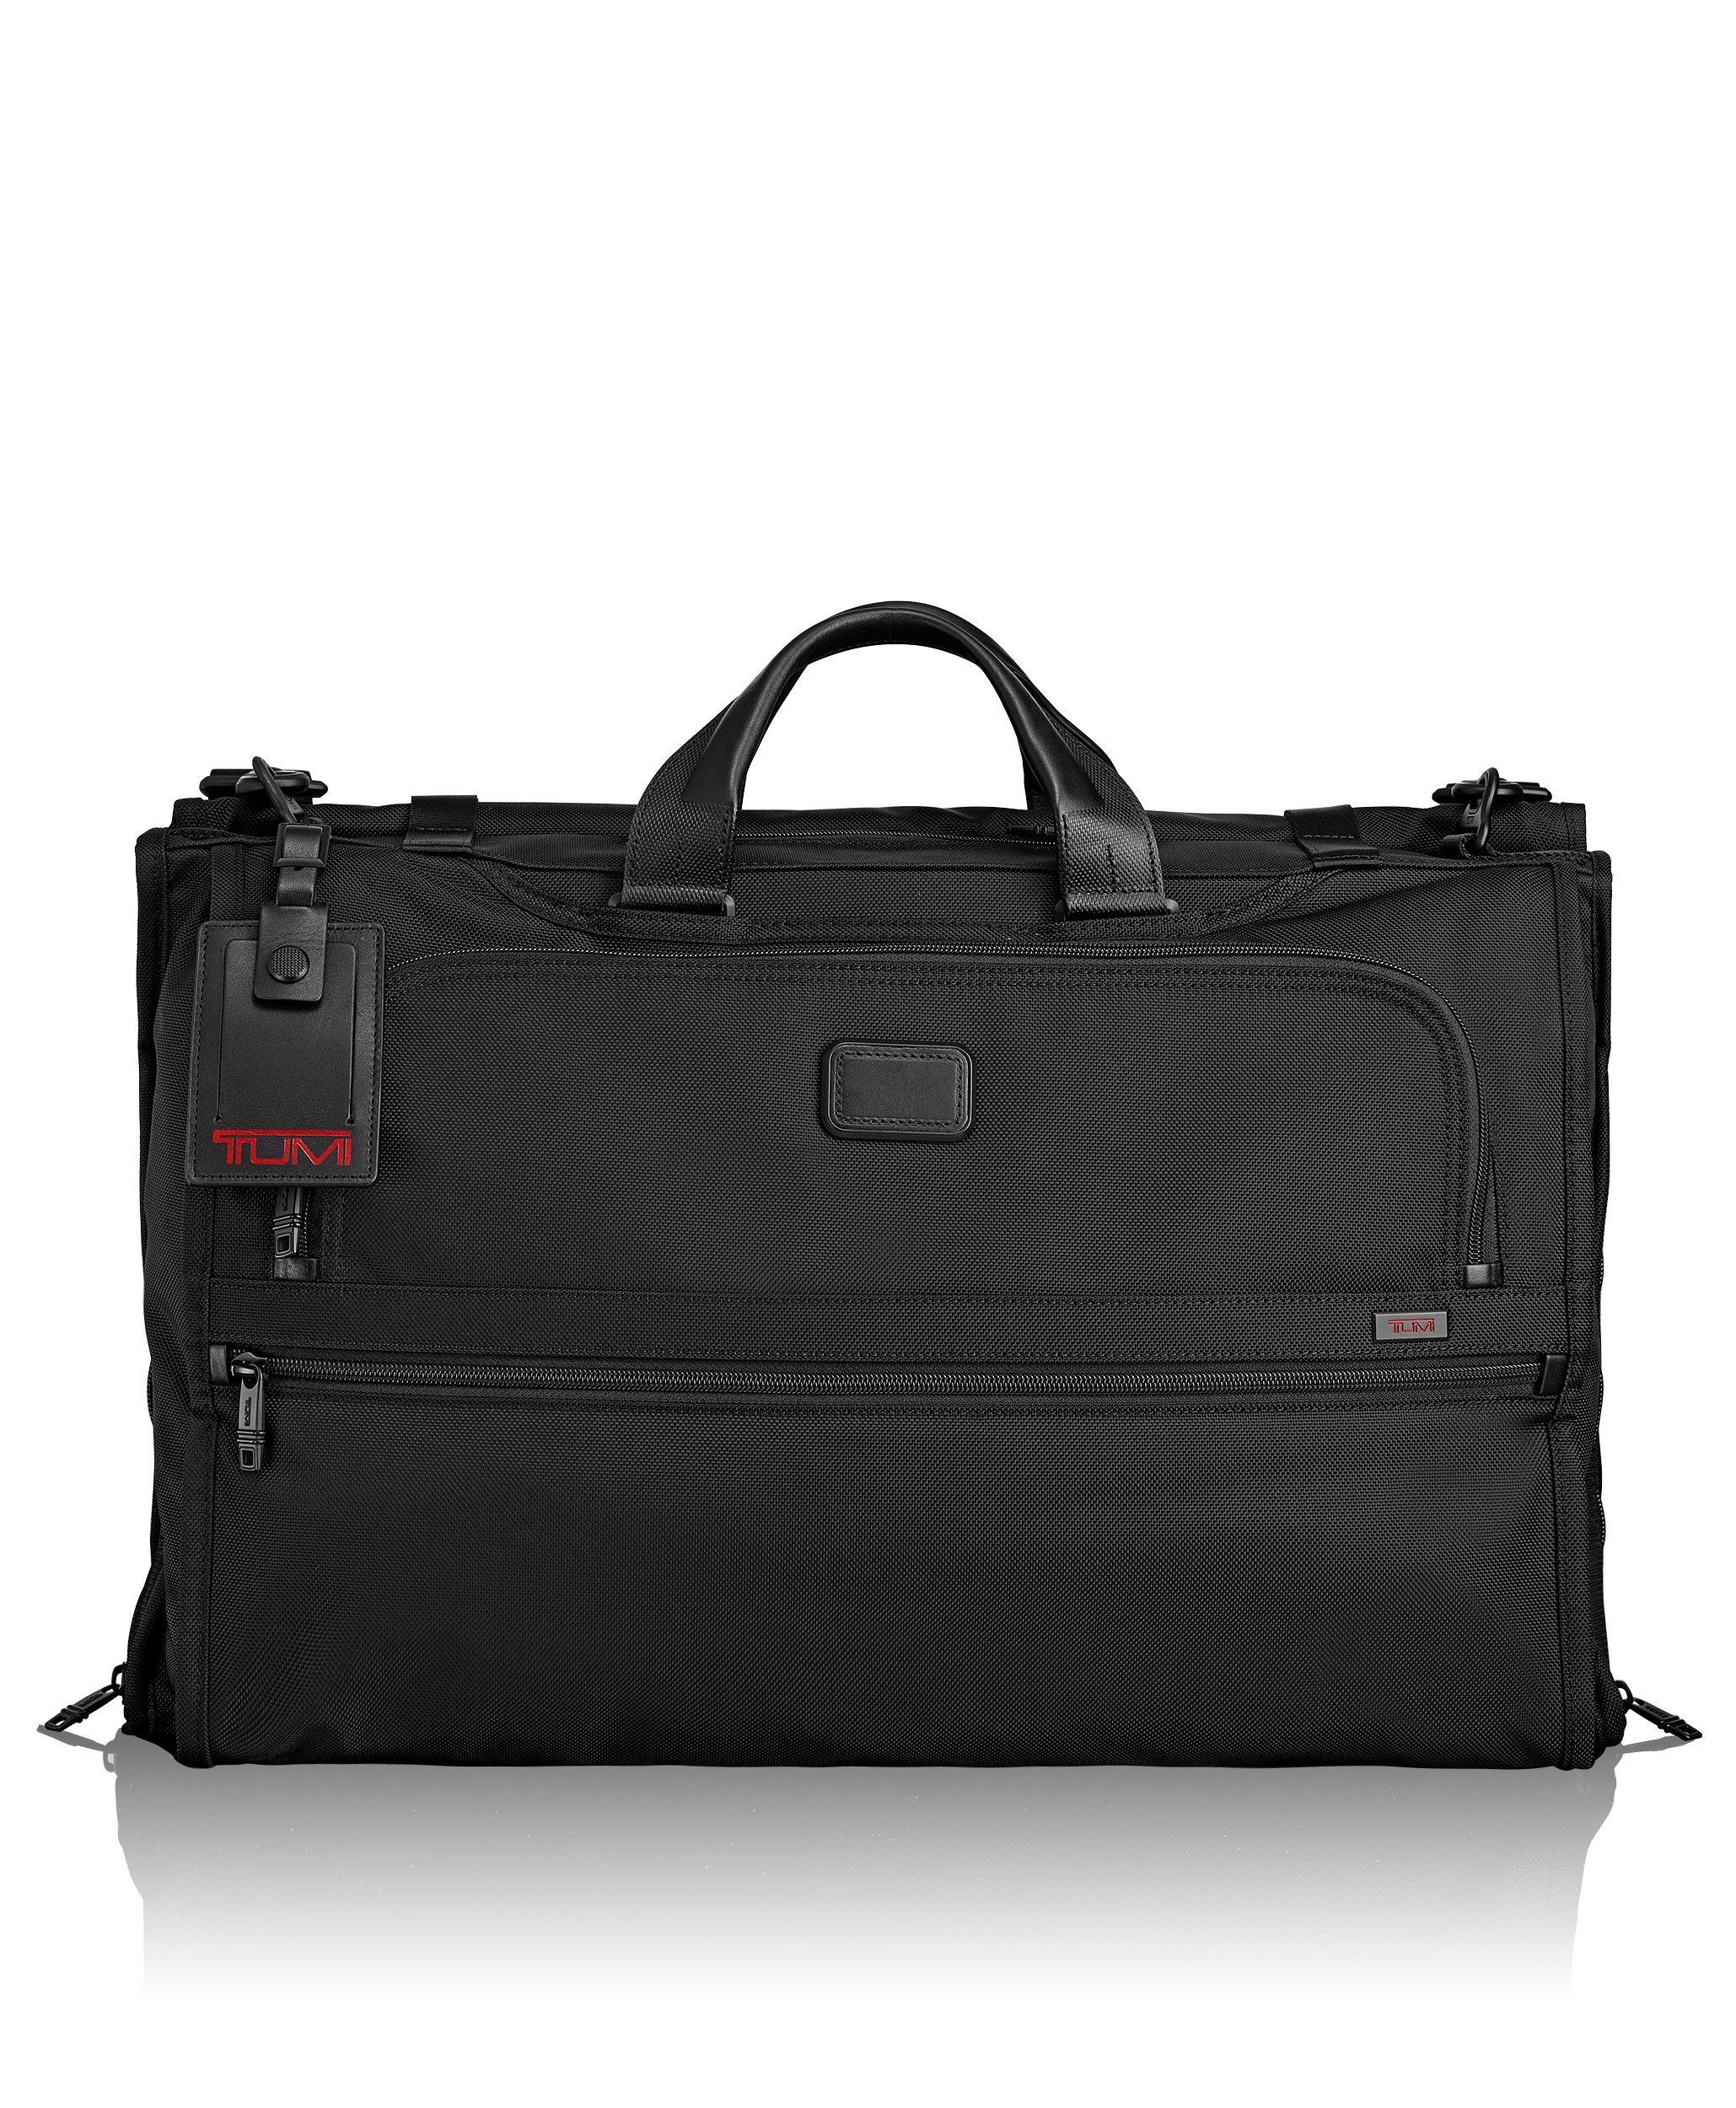 Tumi Alpha 2 Tri-Fold Carry-on Garment Bag, Black